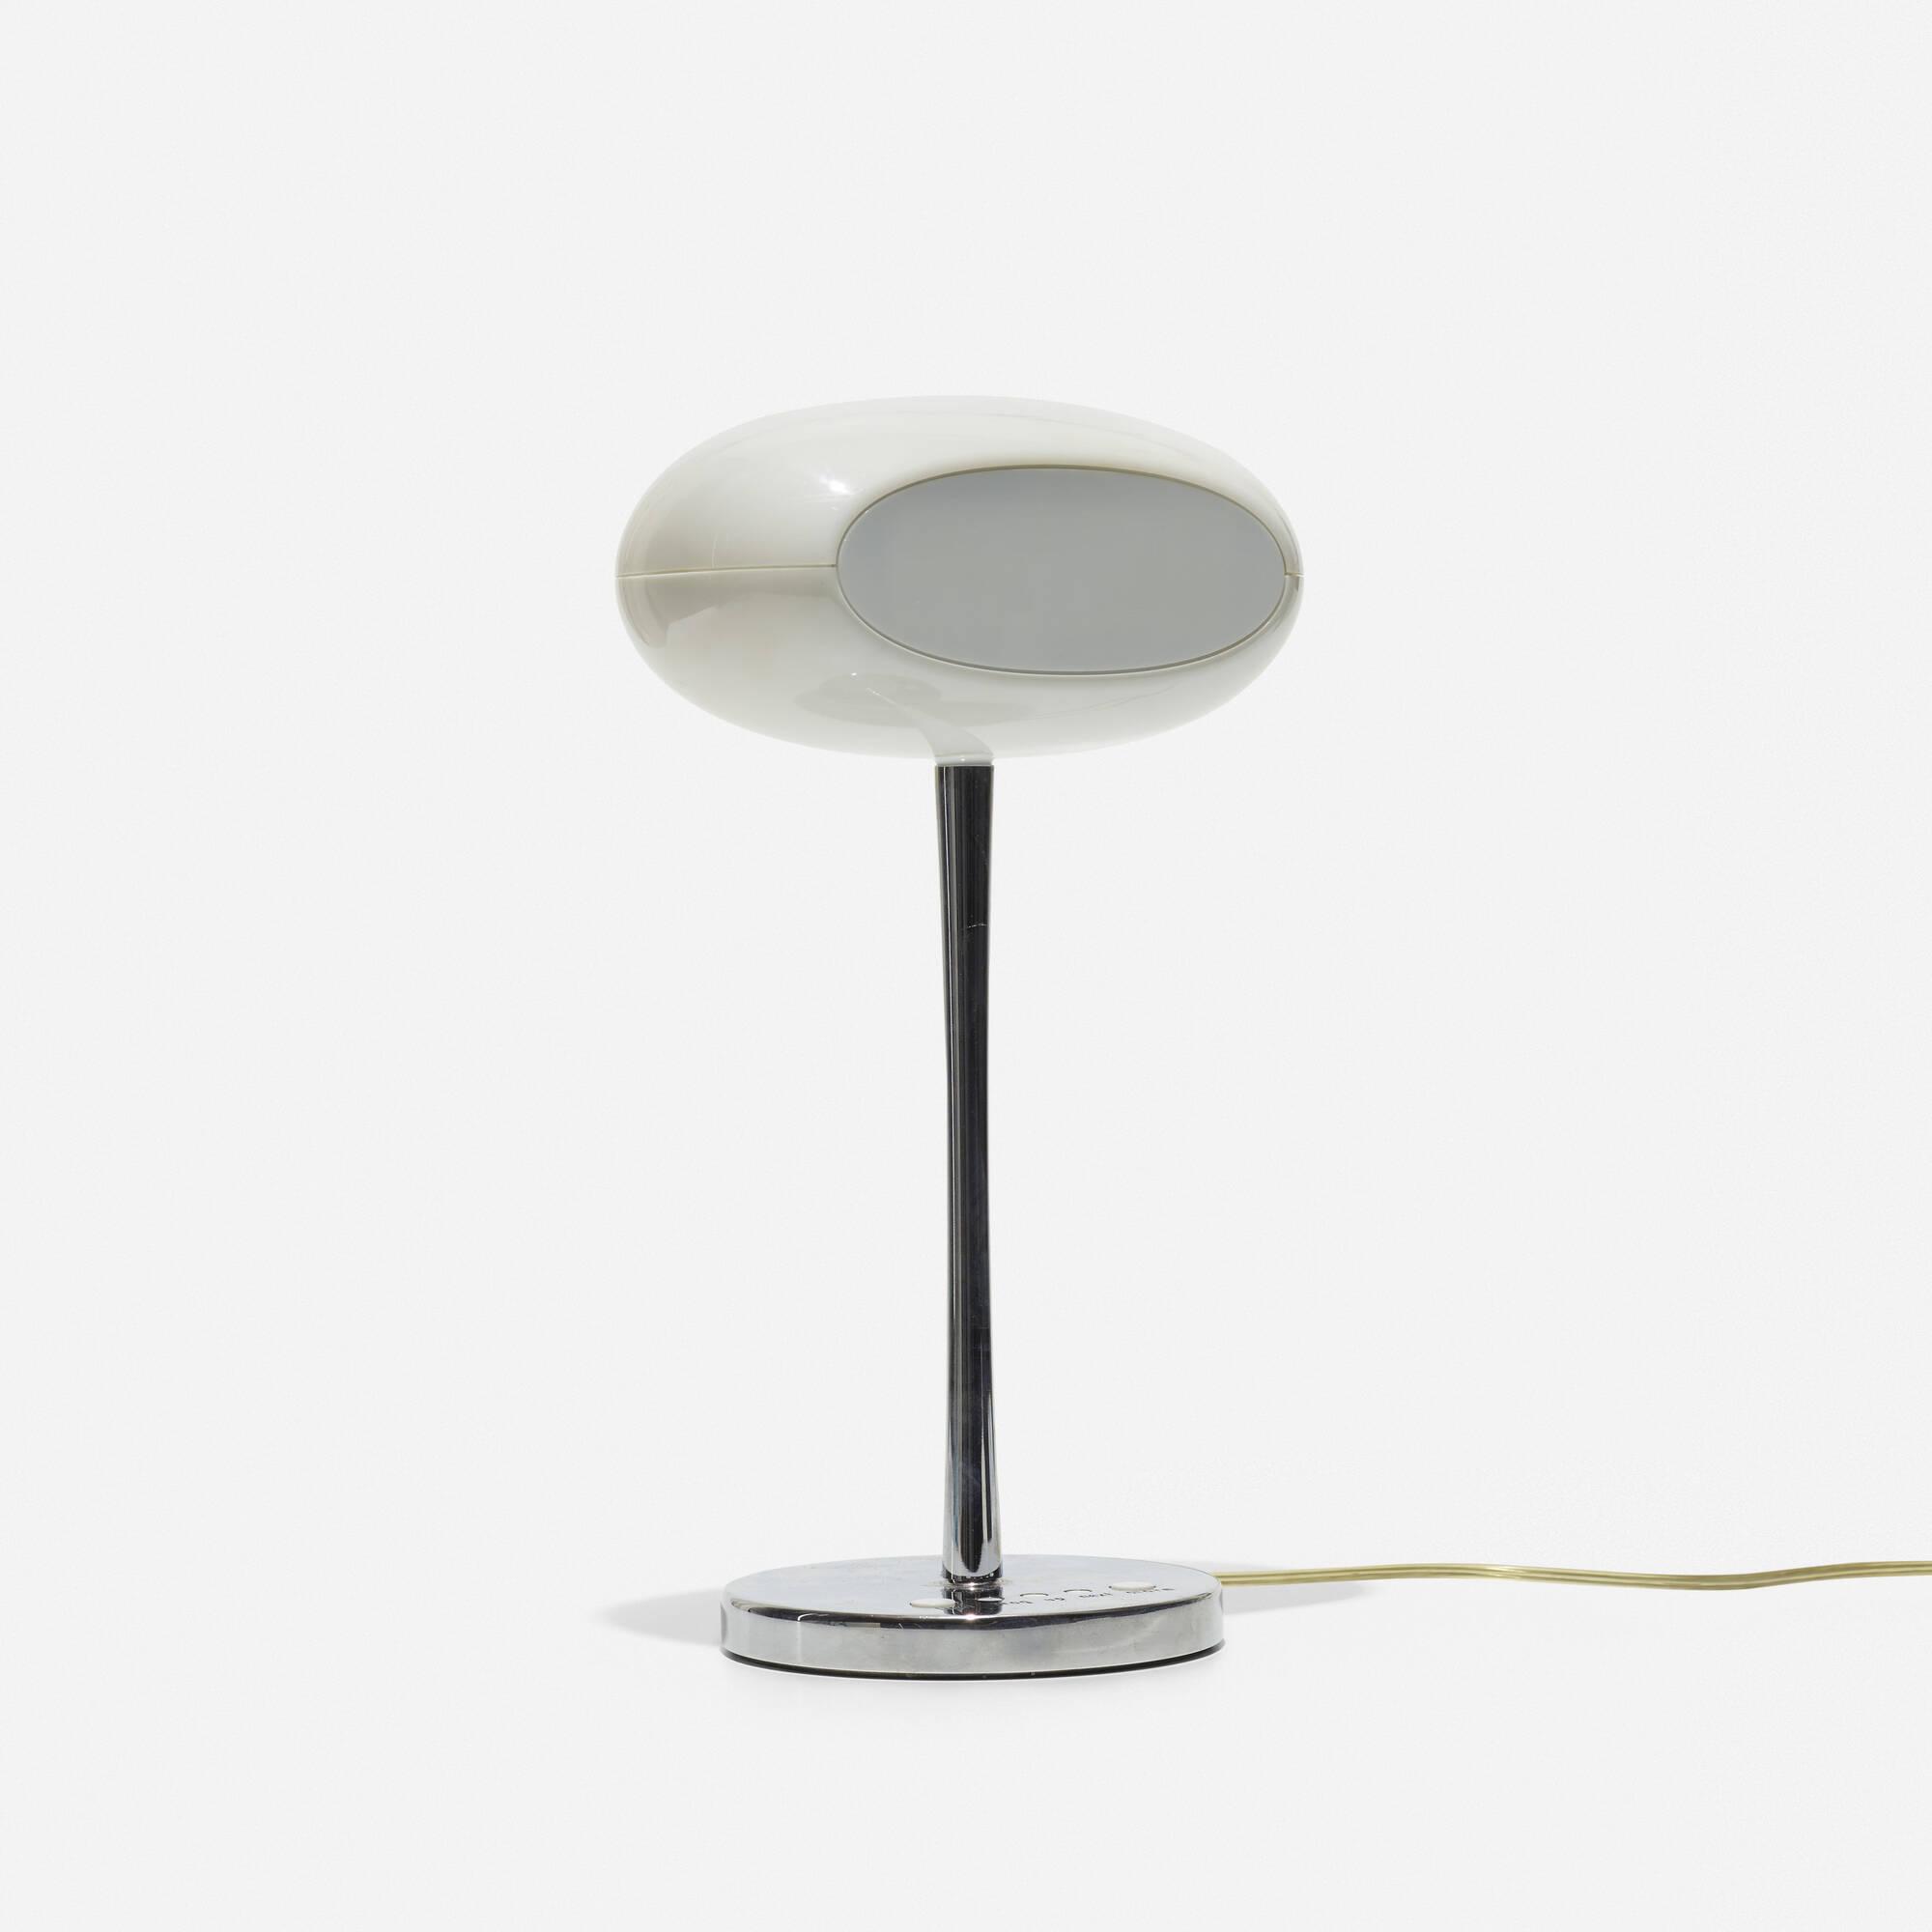 260: Karim Rashid / Time and Space clock lamp (1 of 2)